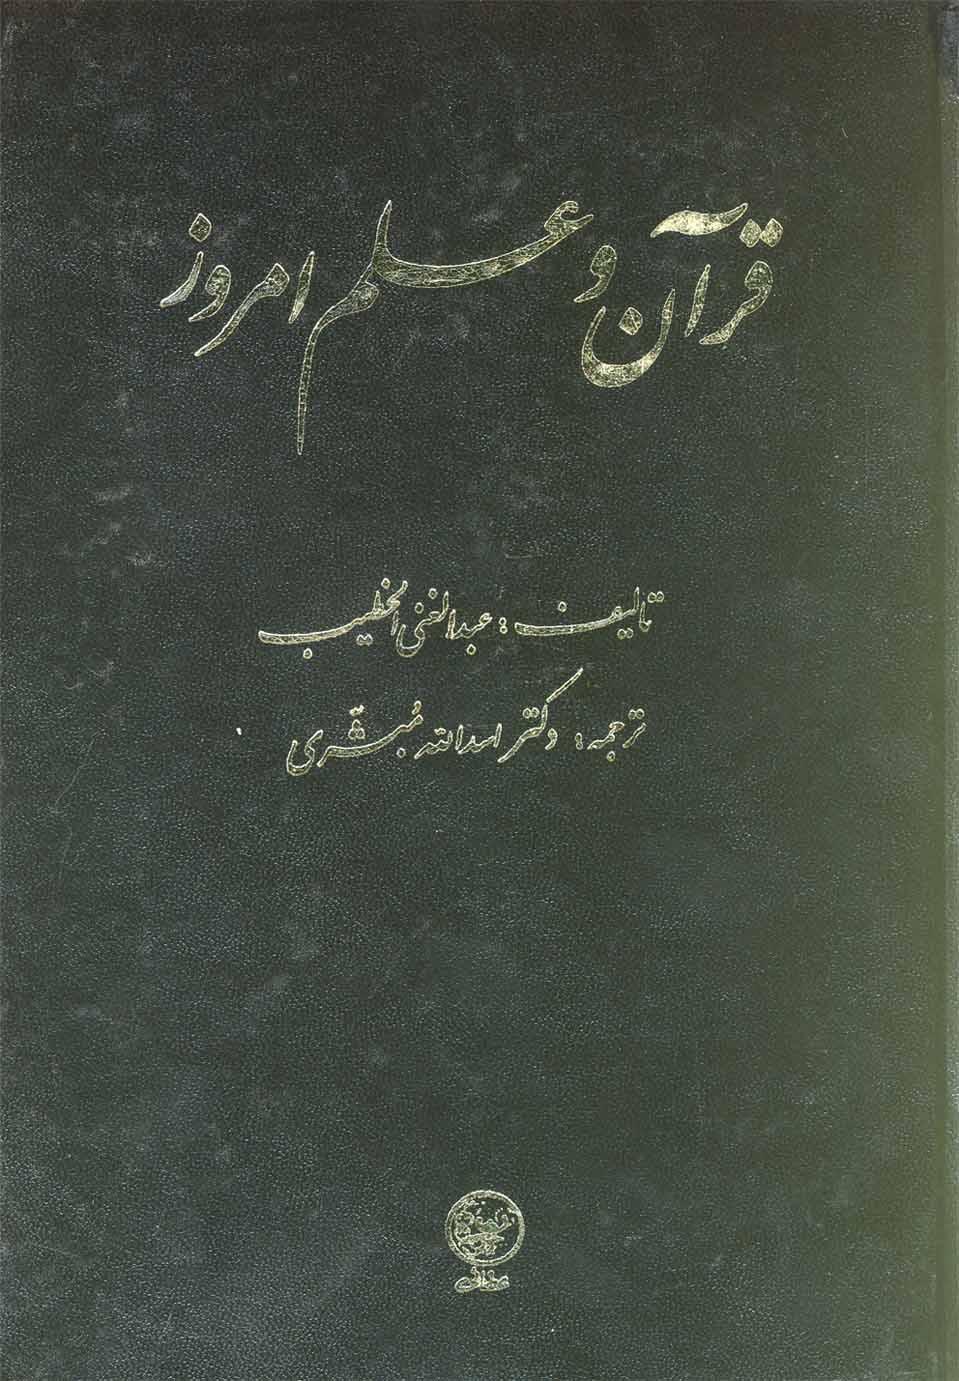 قرآن و علم امروز(عطايي) *